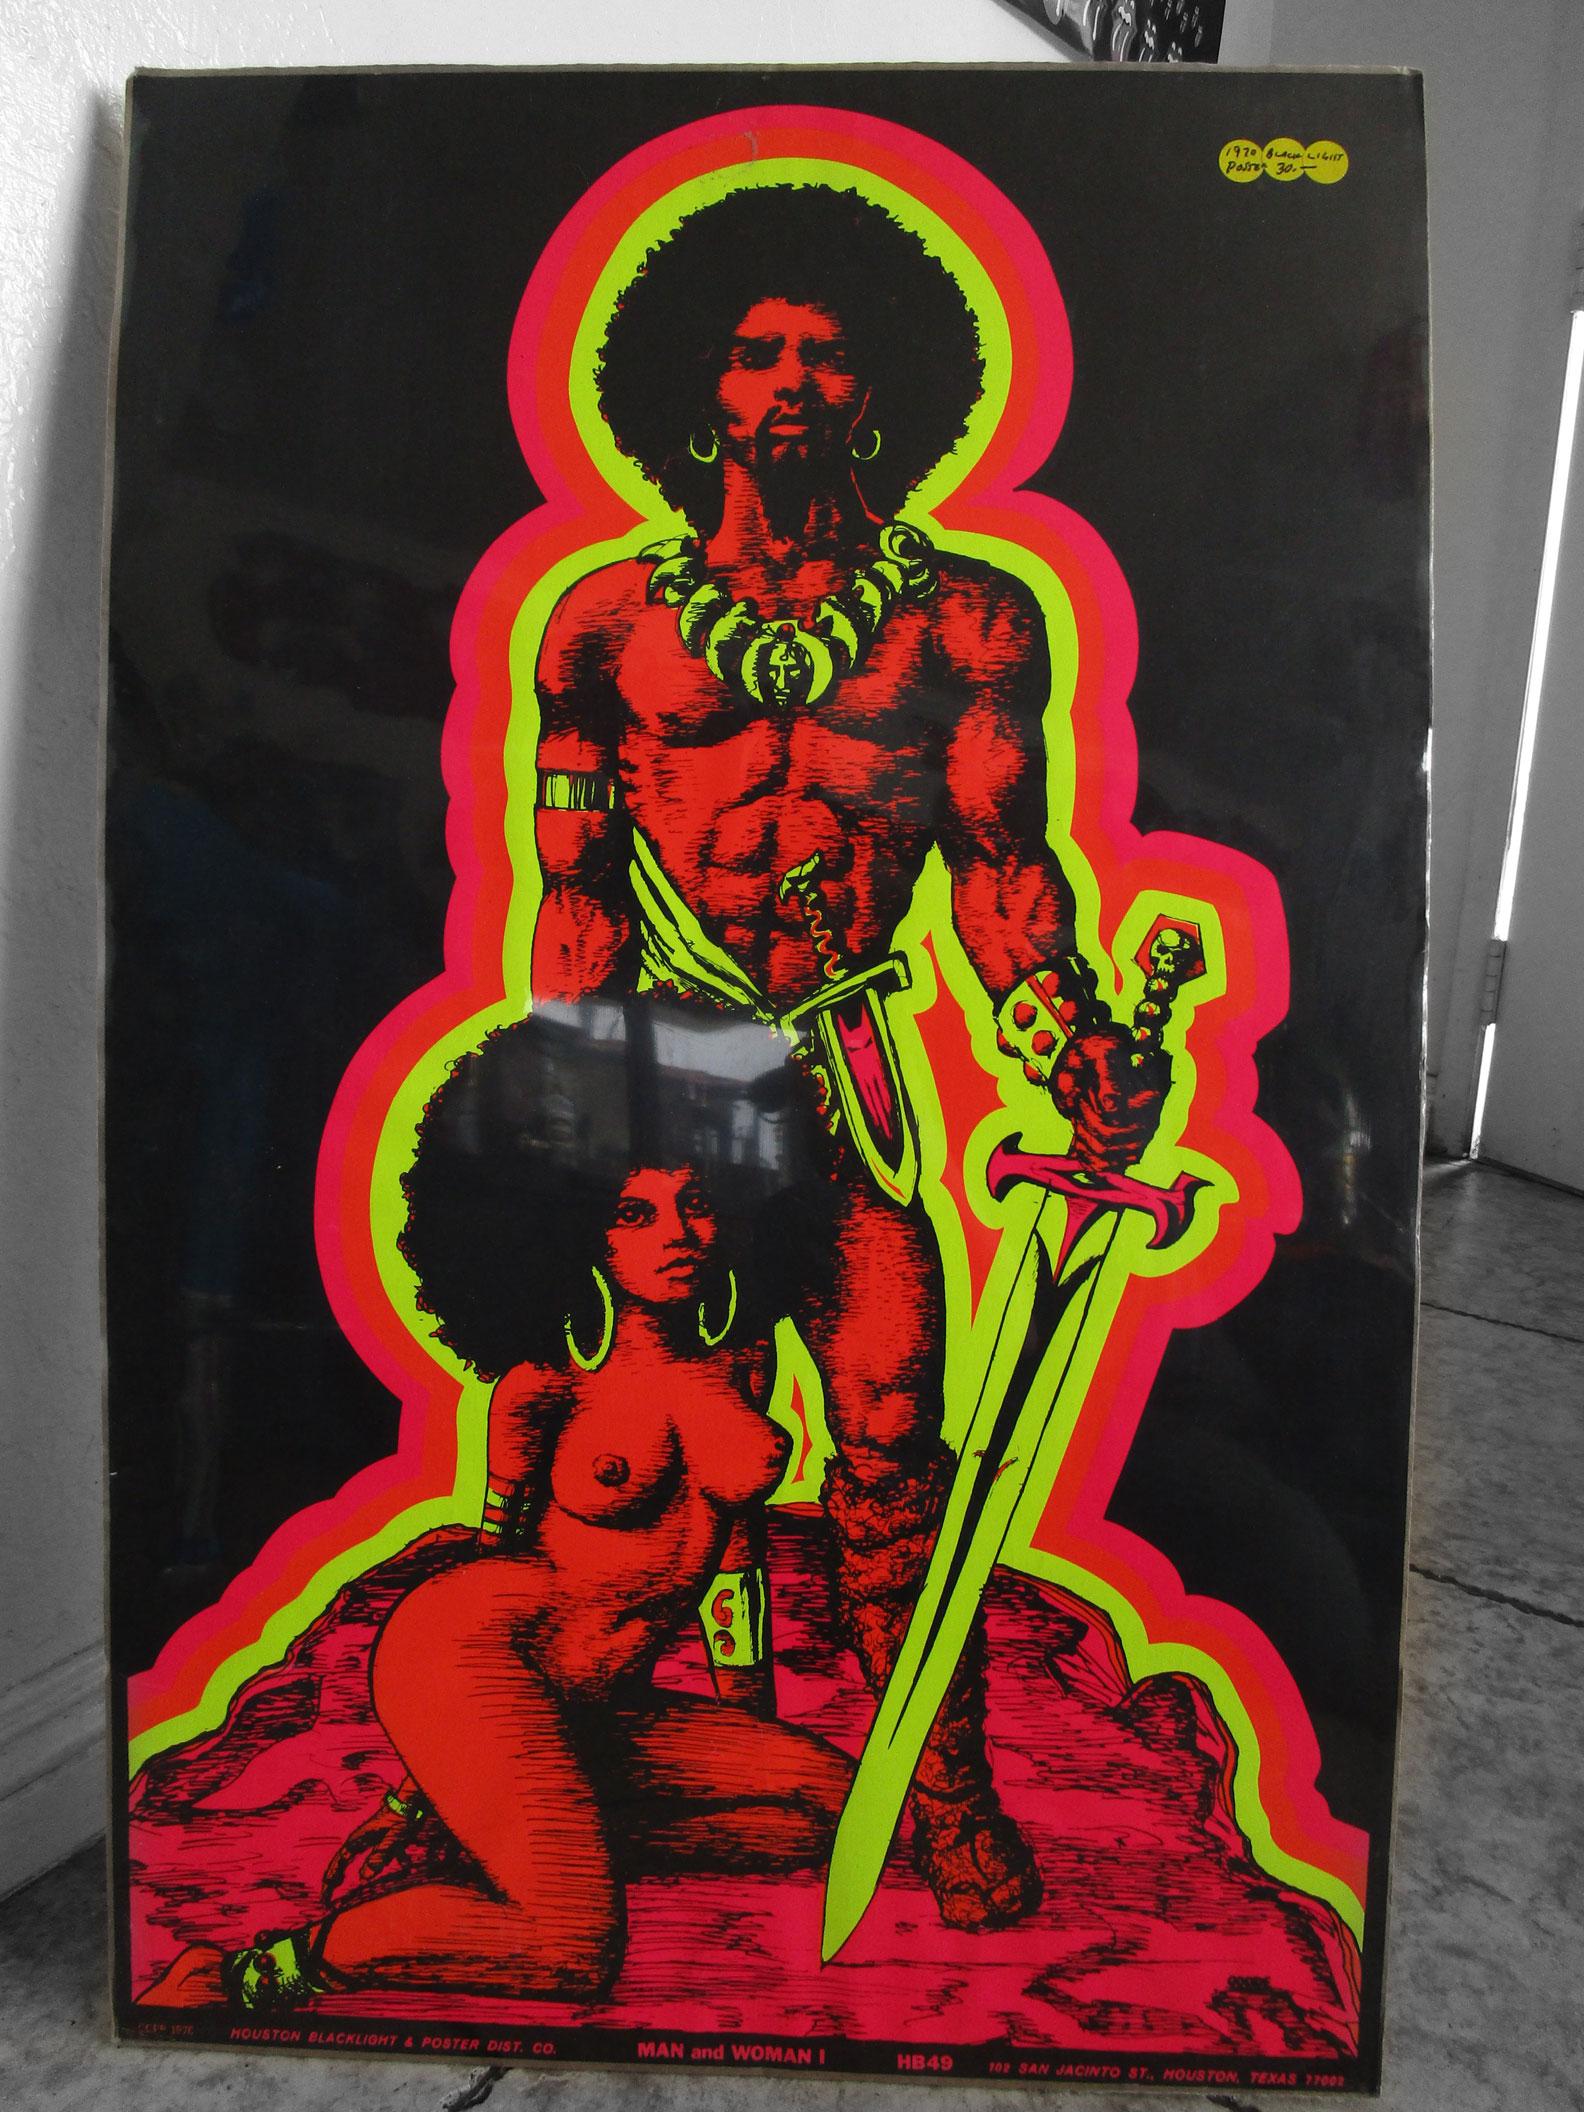 Black Lite Poster - $200